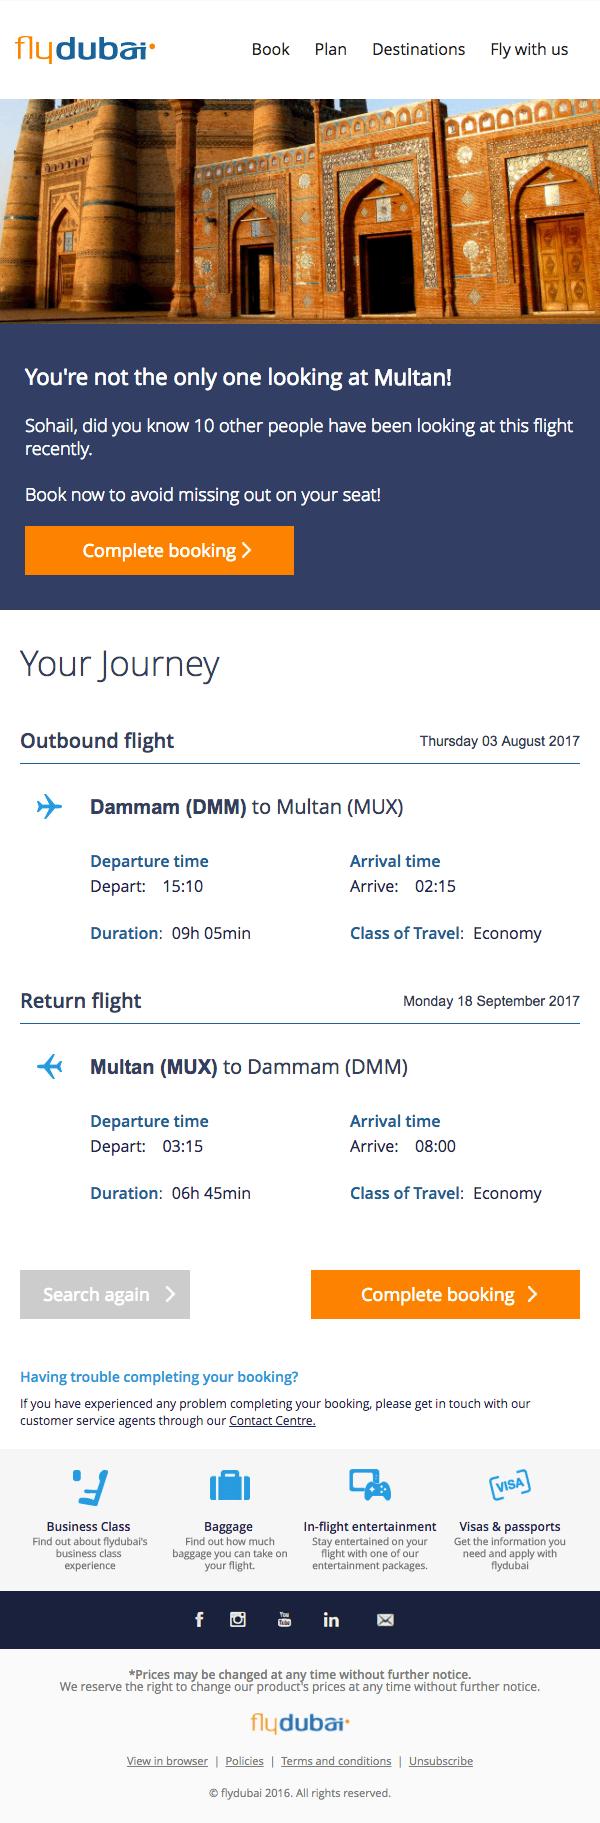 FlyDubai cart abandonment email